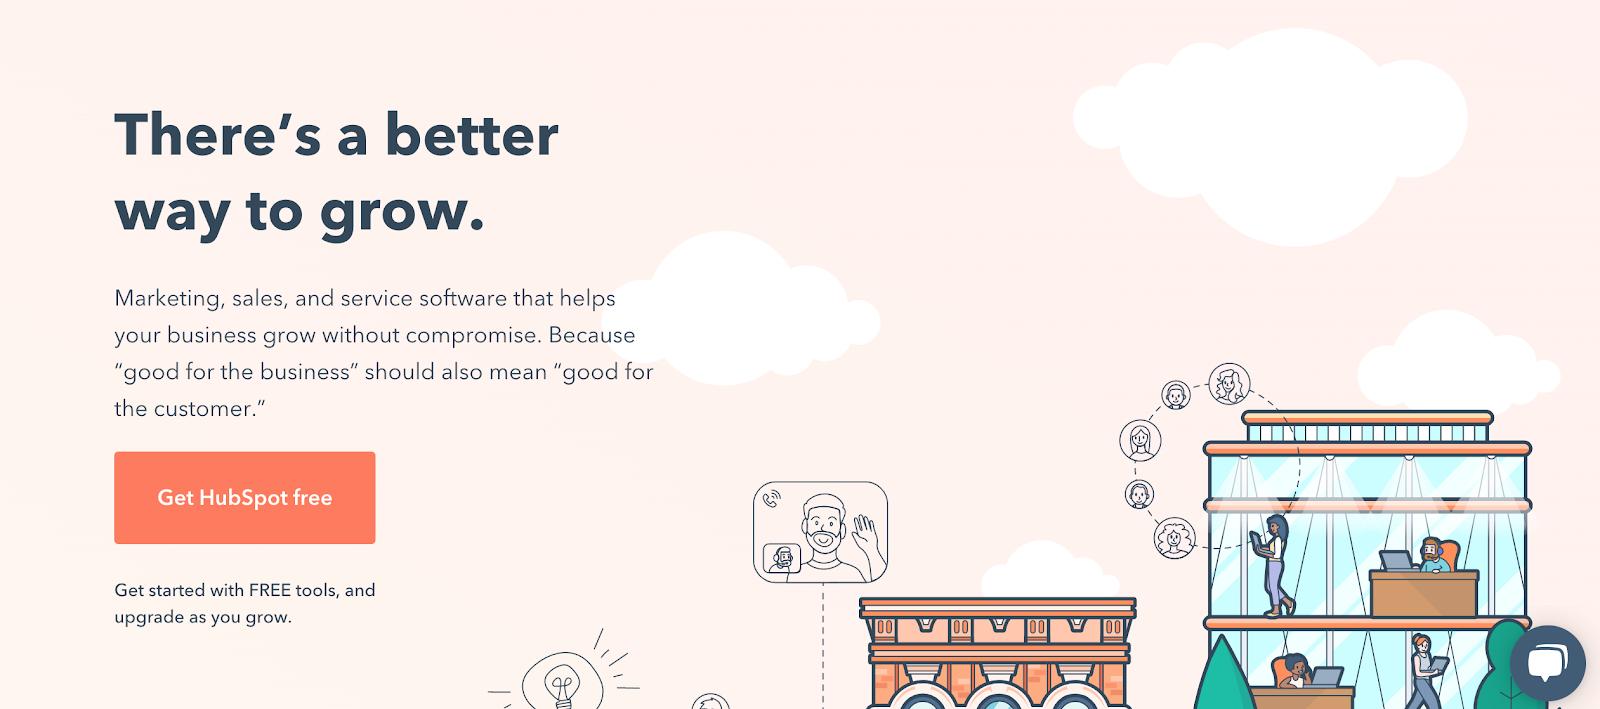 HubSpot: Reducing customer churn starts on the homepage